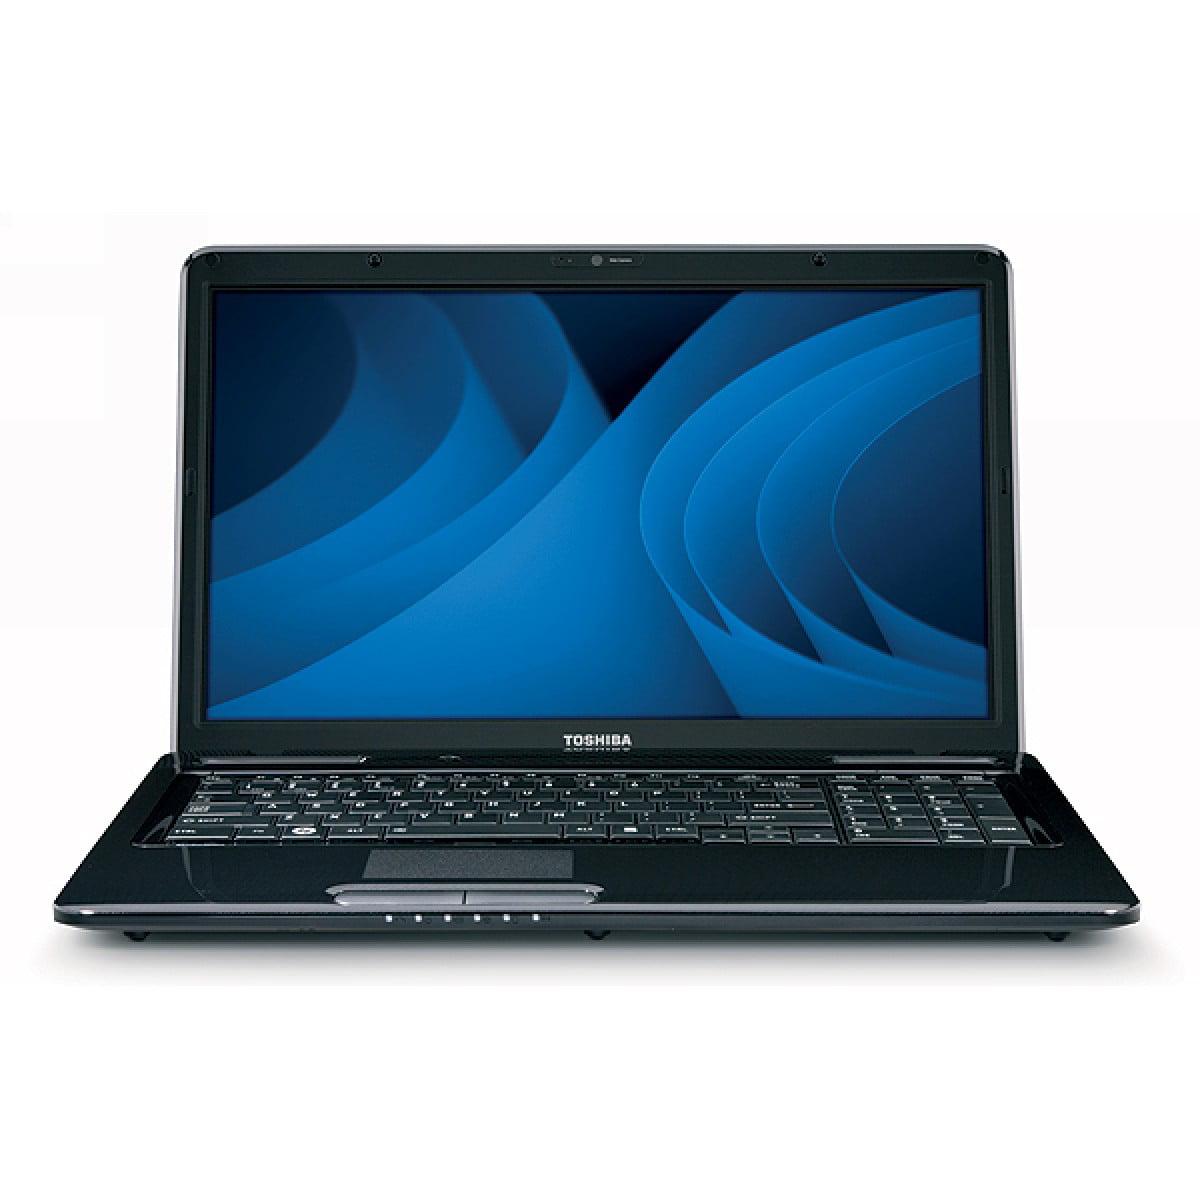 "Refurbished Toshiba L675D-S7106 Laptop 17.3"" AMD Triple Core 4GB Memory 500GB Drive Win 7"